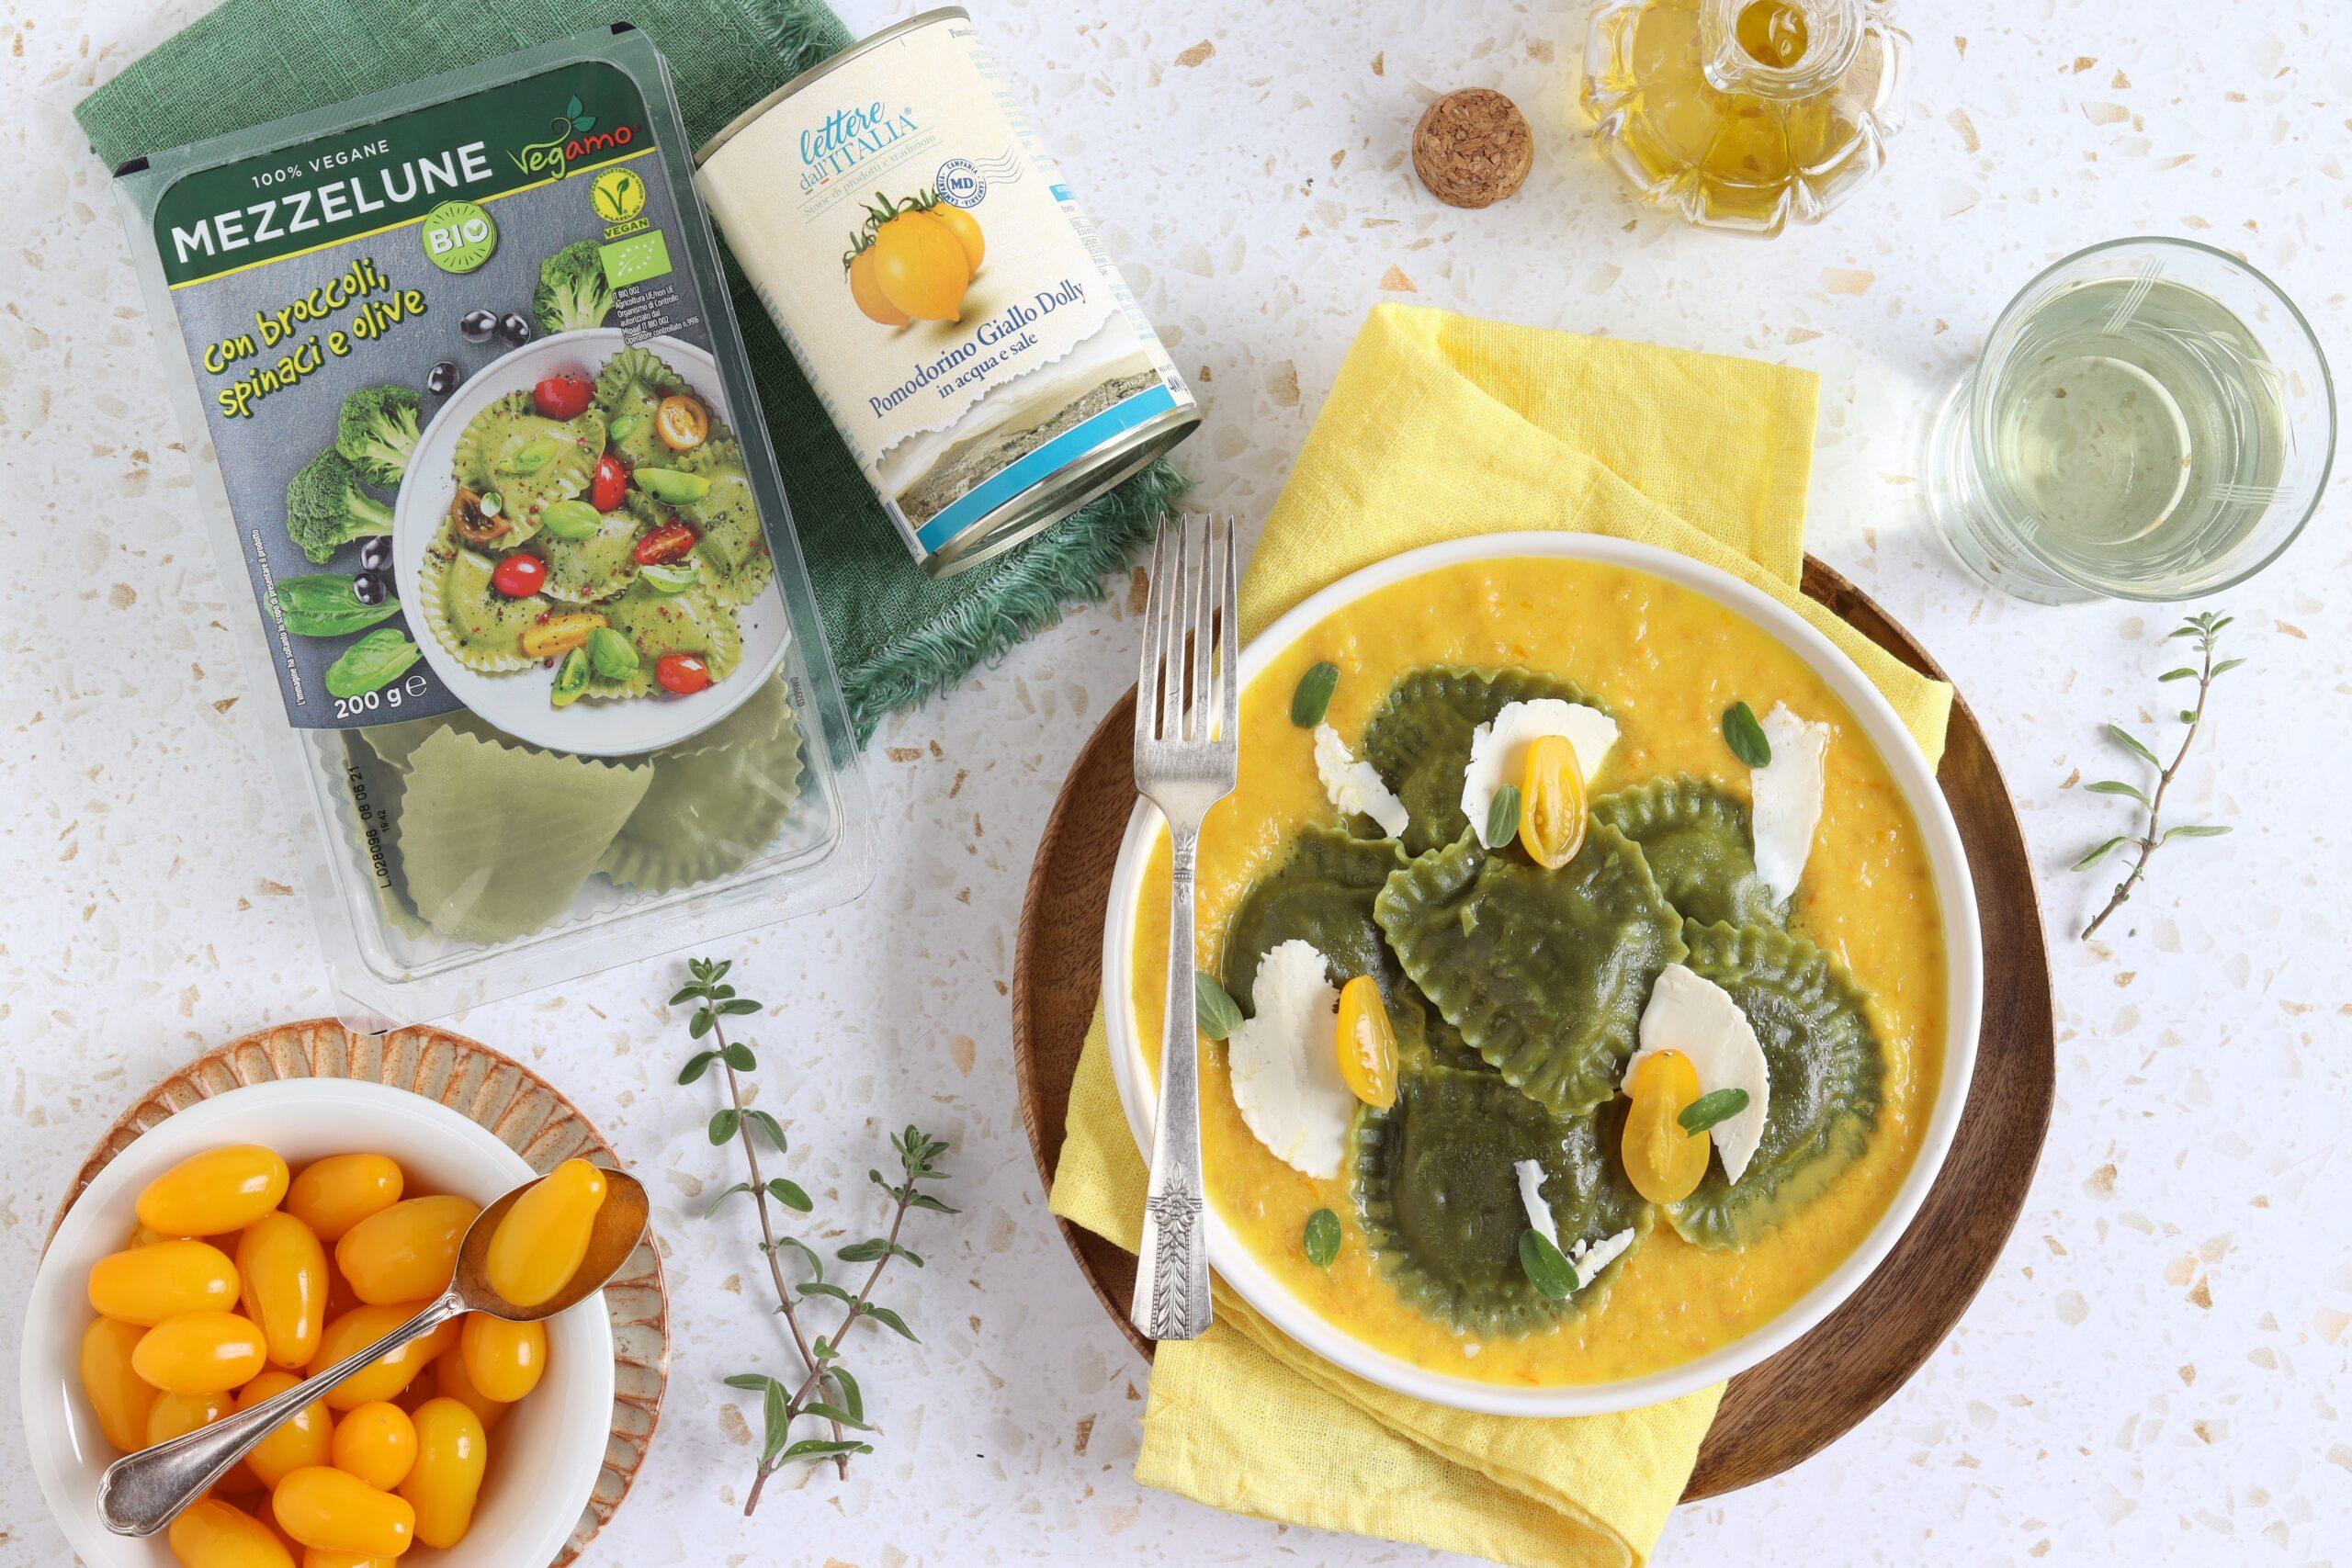 Mezzelune ai broccoli e pomodori gialli